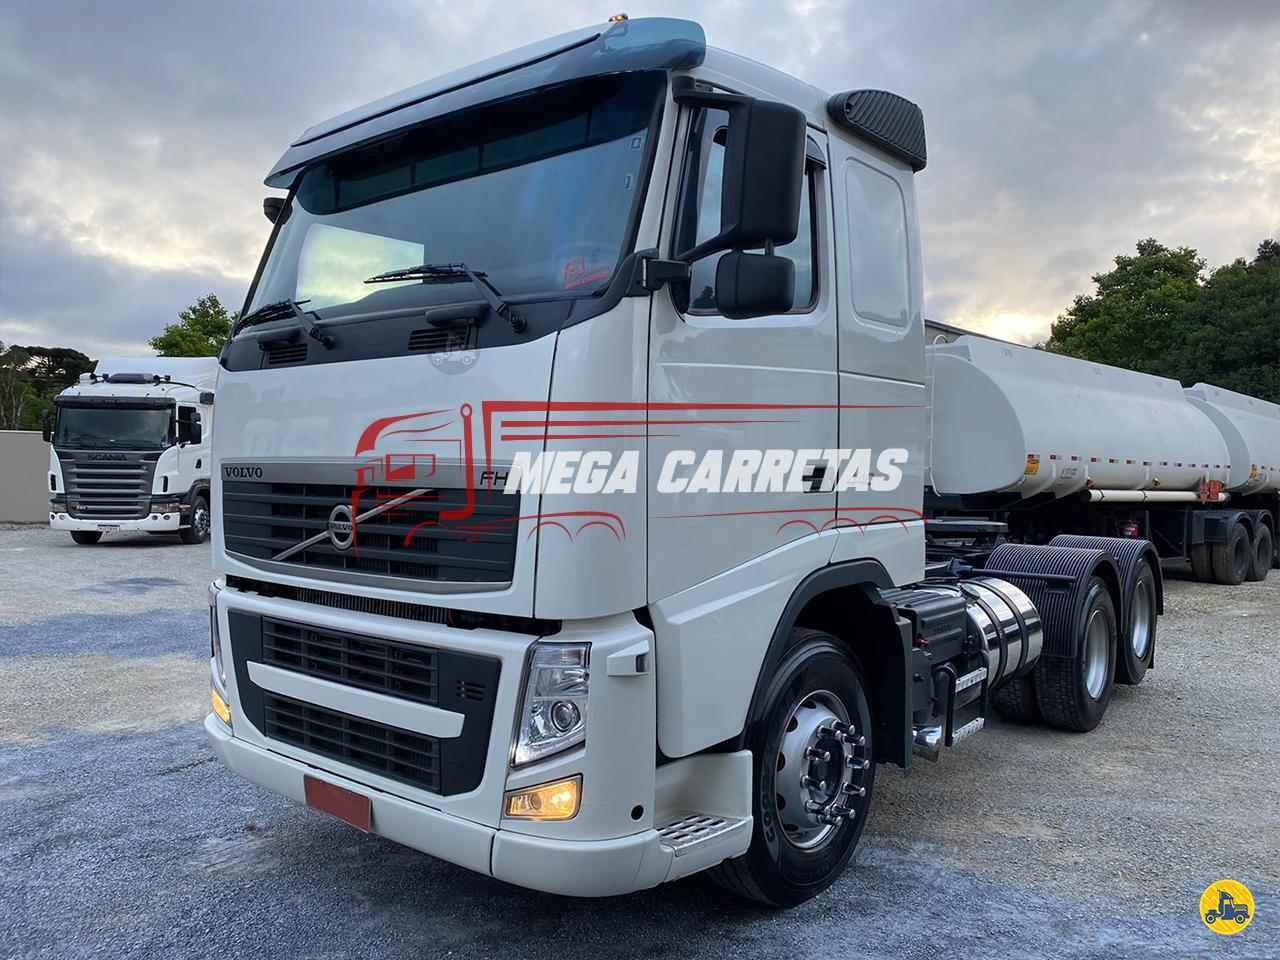 CAMINHAO VOLVO VOLVO FH 440 Cavalo Mecânico Truck 6x2 Mega Carretas COLOMBO PARANÁ PR